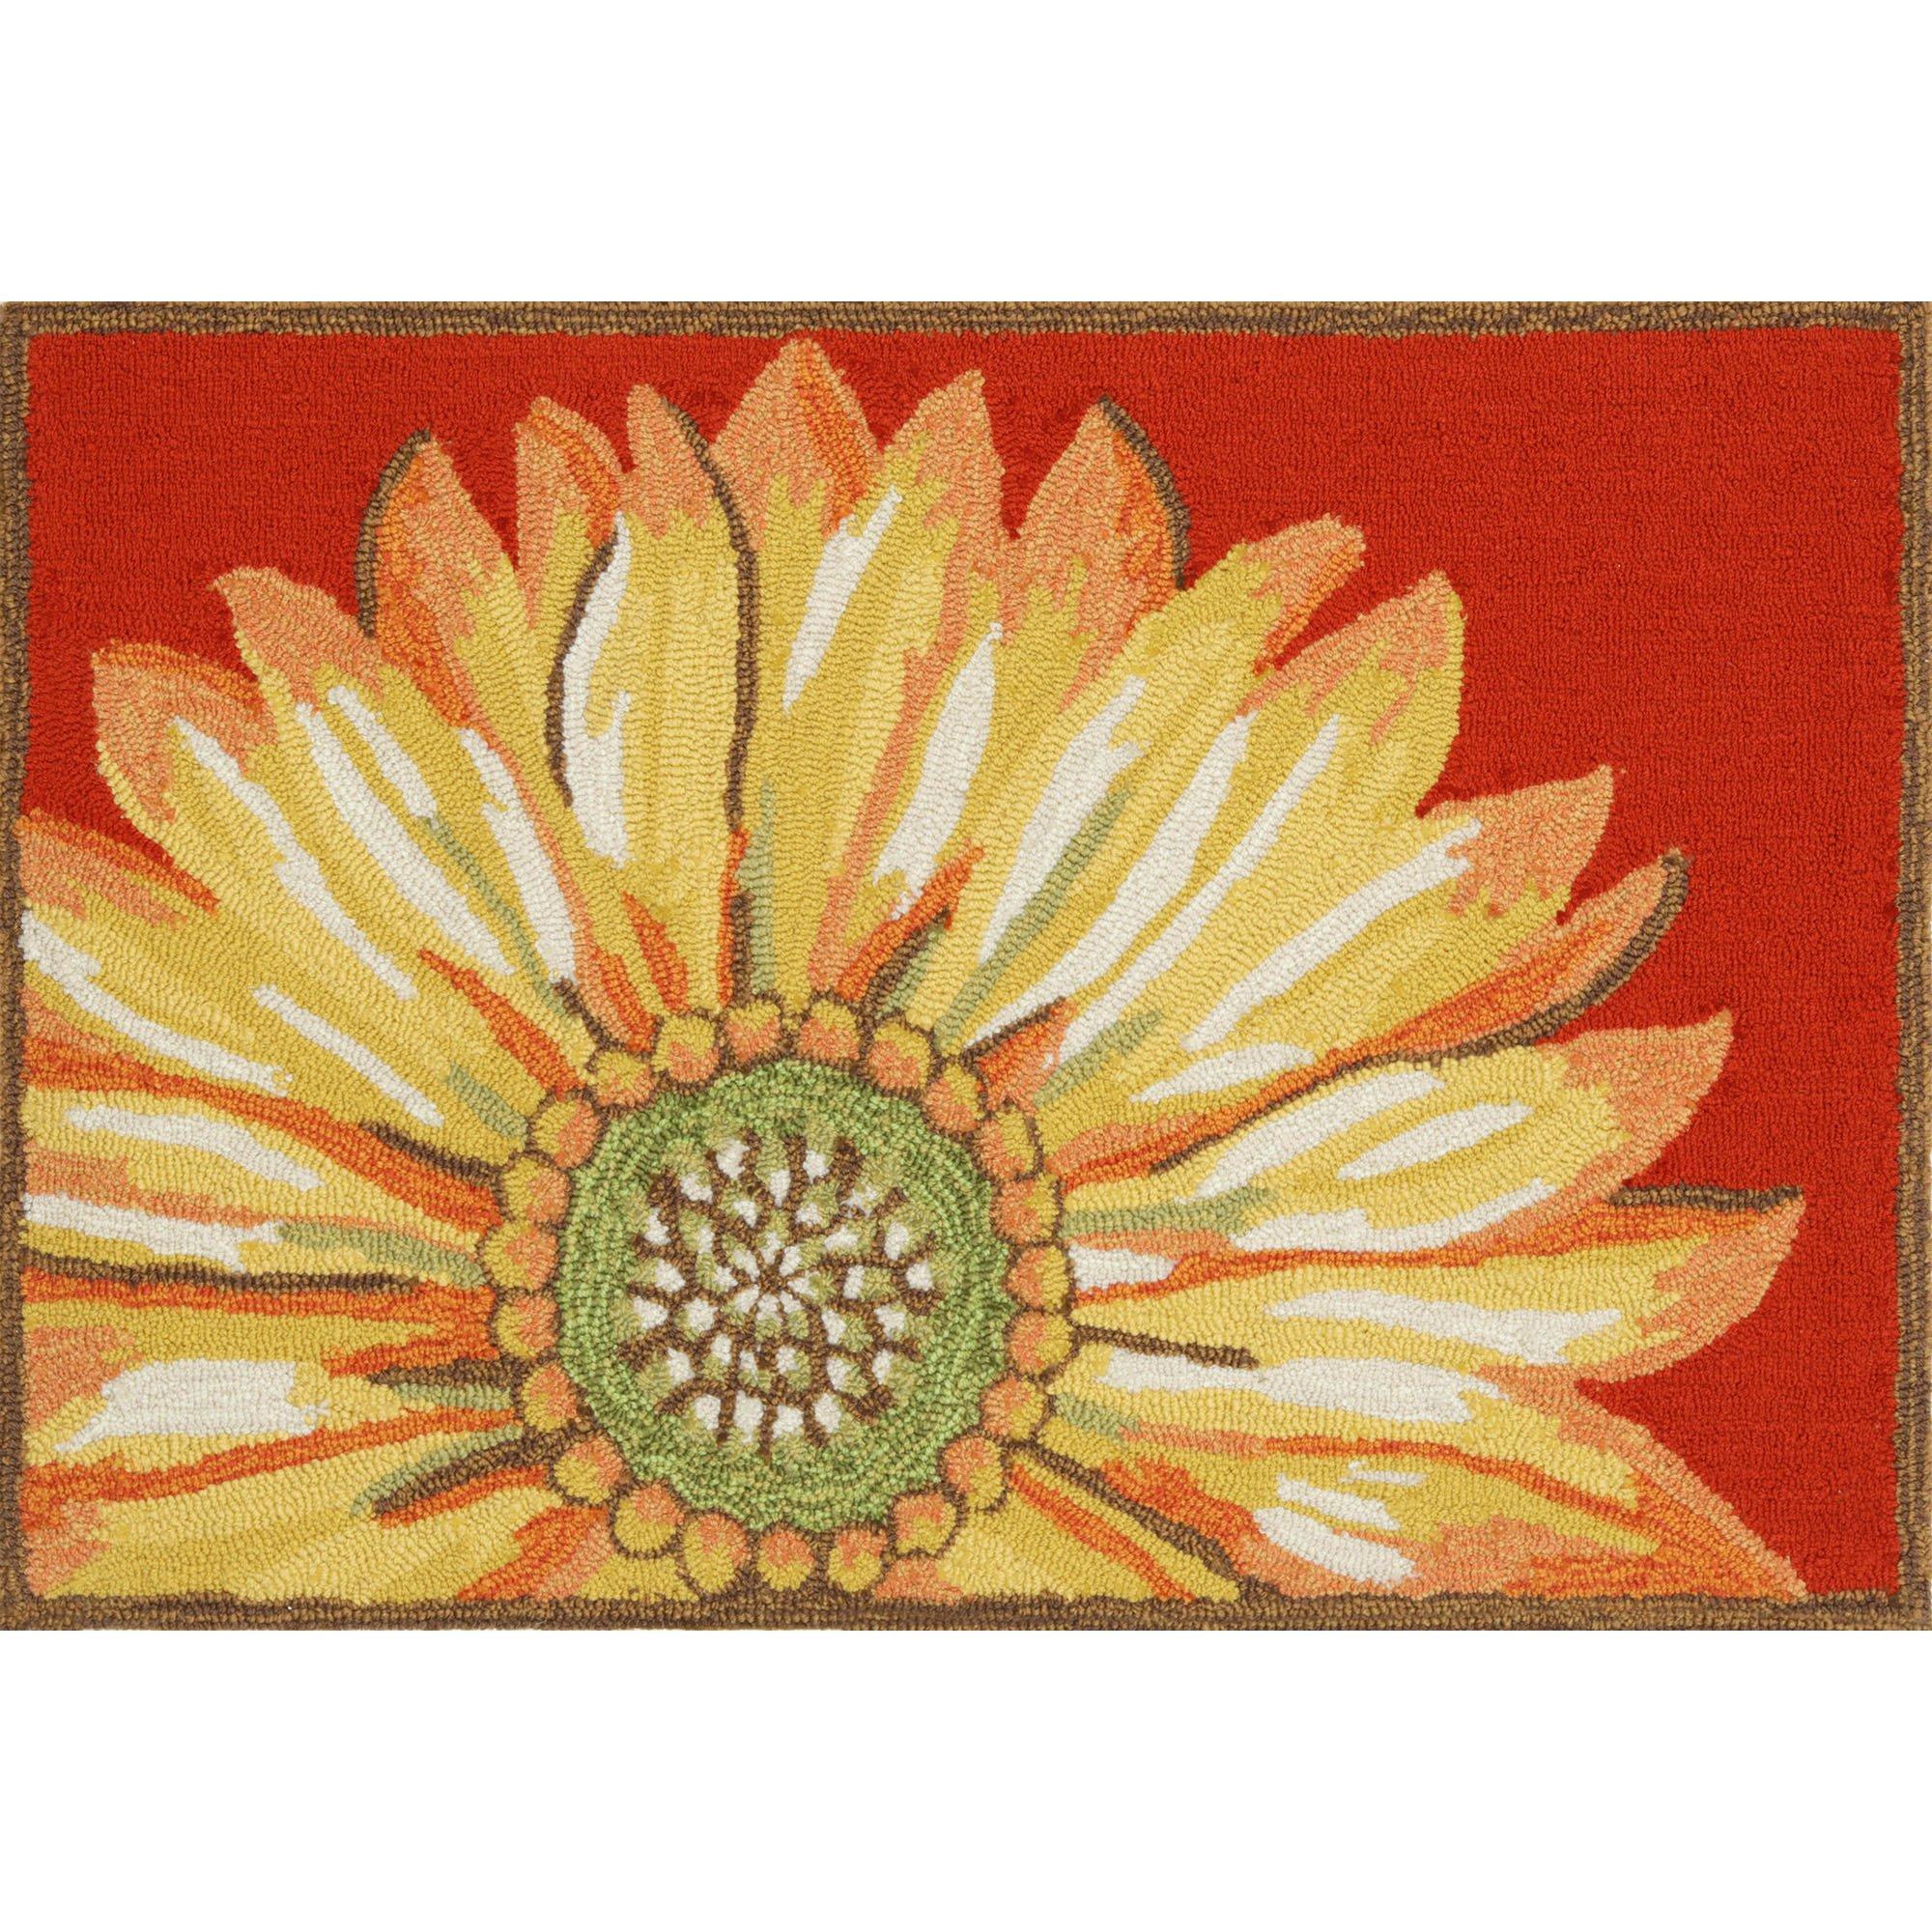 Liora Manne FT023A50224 Whimsy Summer Flower Rug, Indoor/Outdoor, Scatter Size, Red